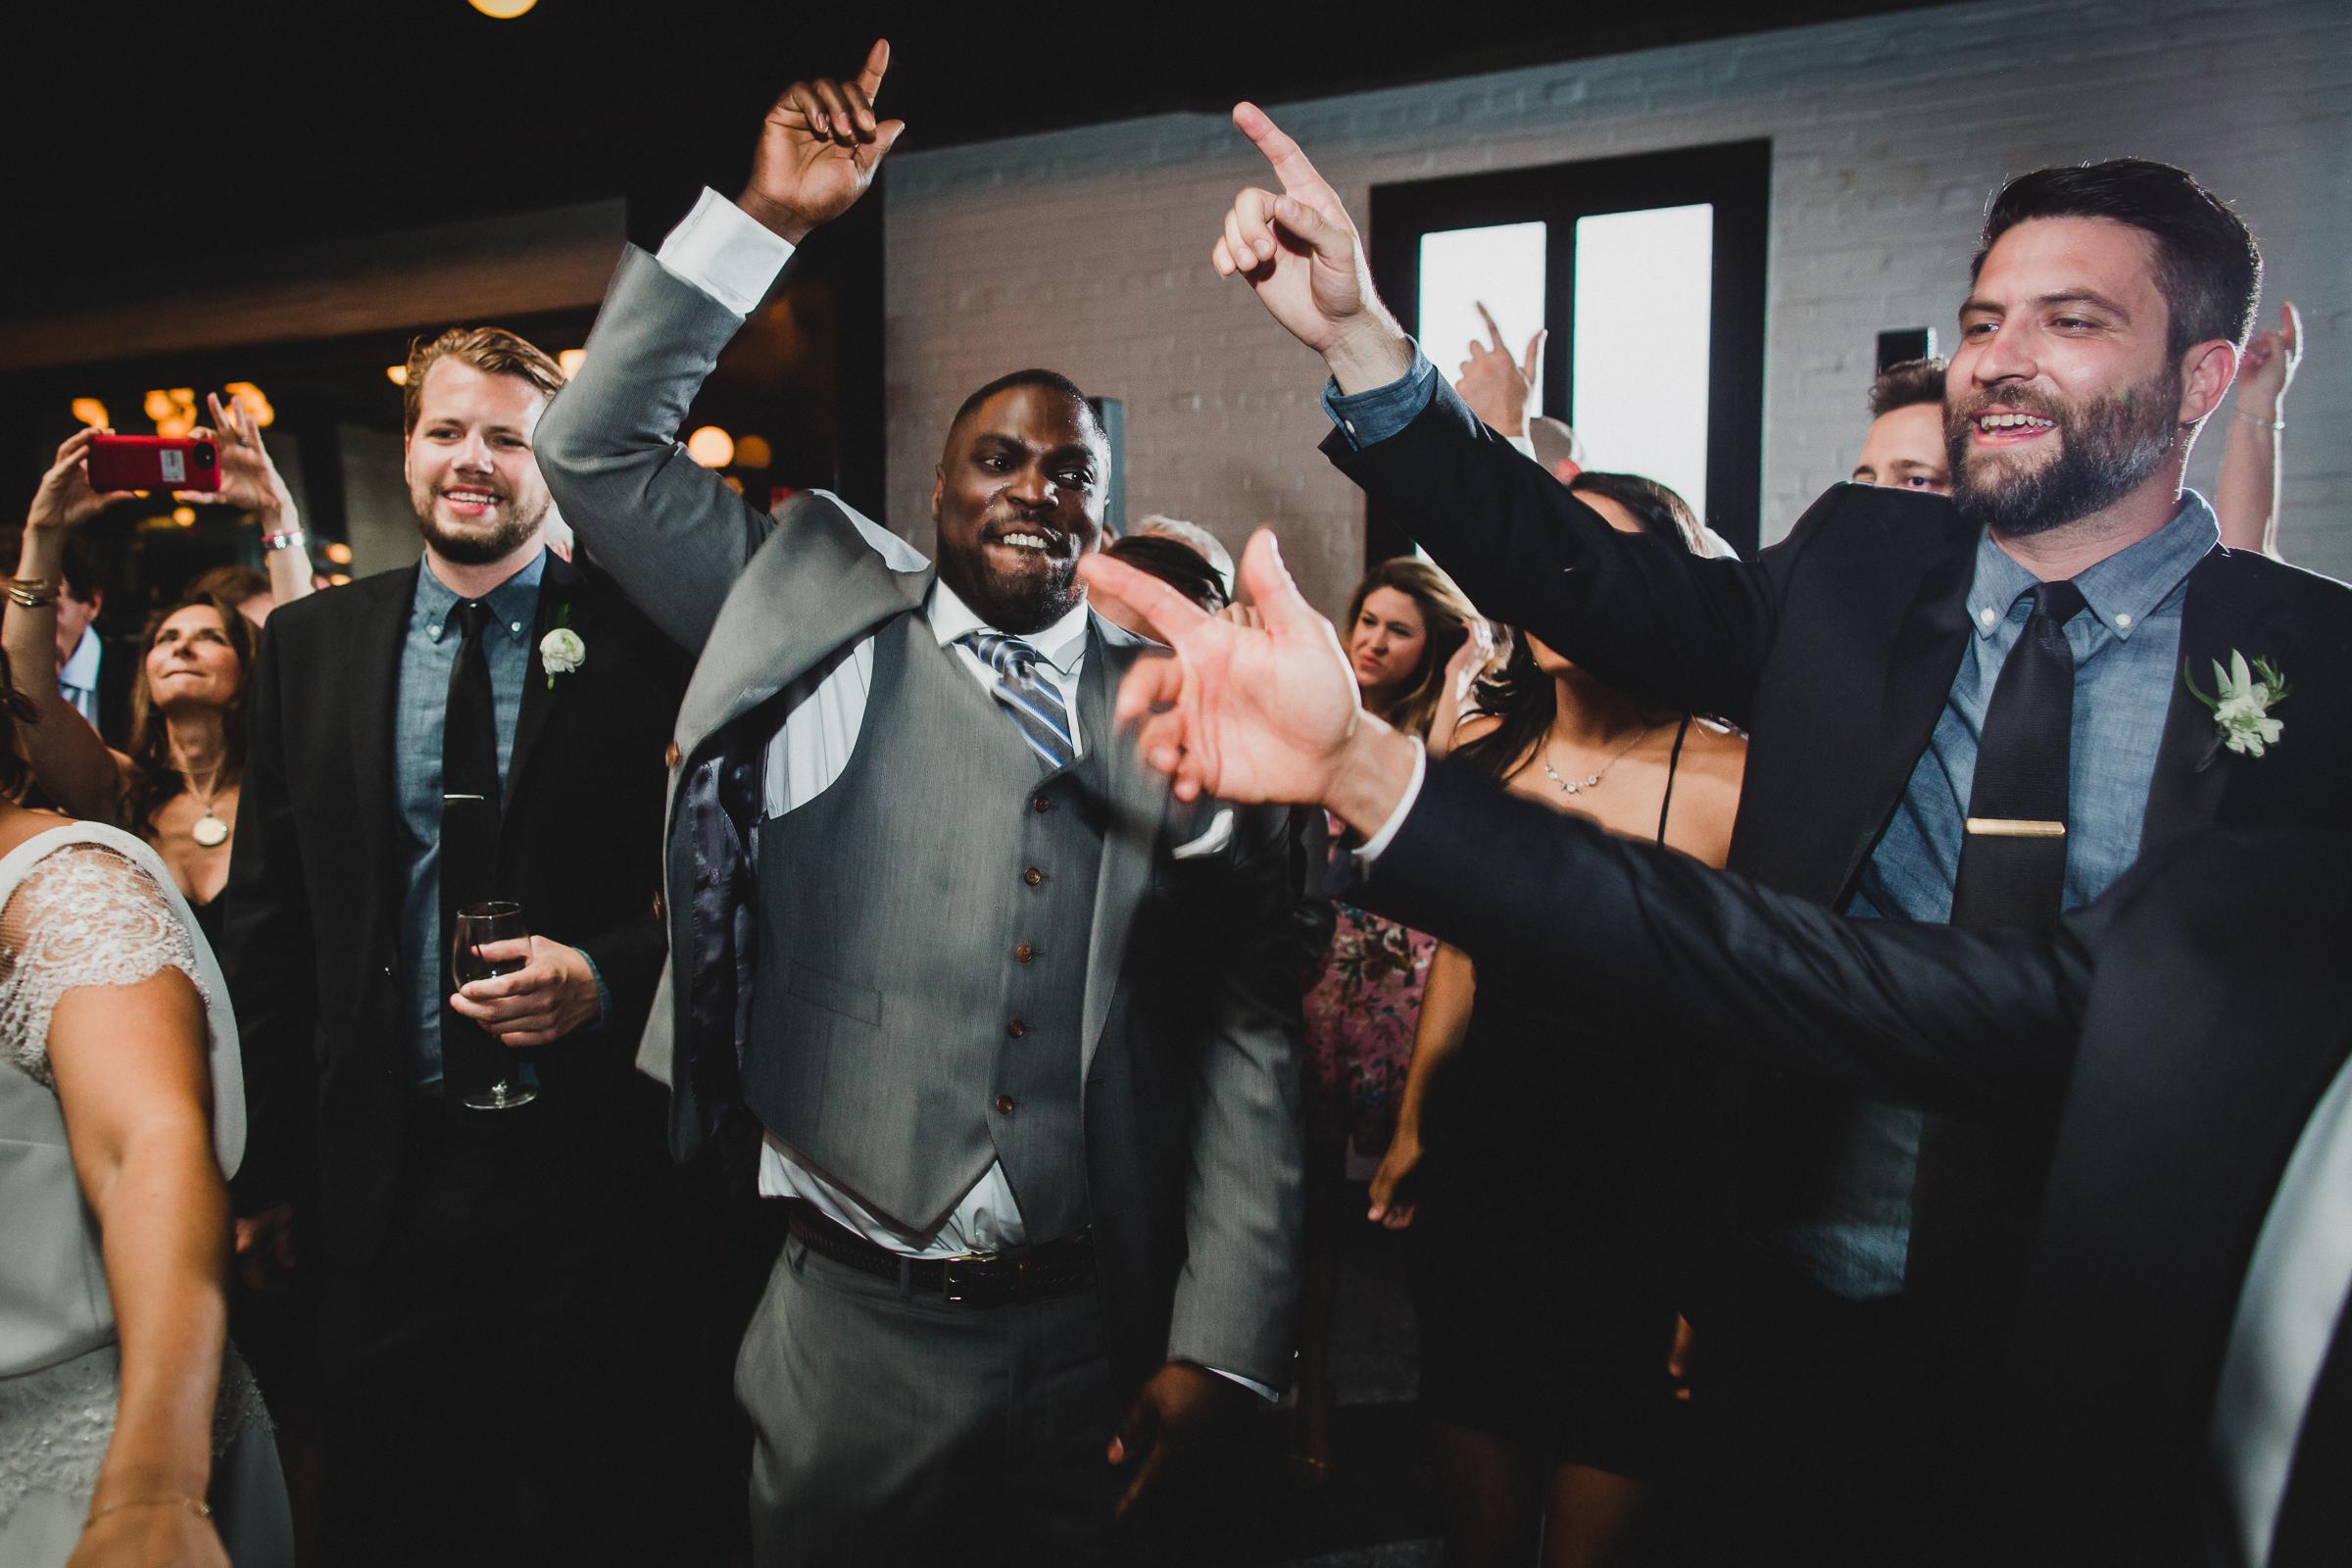 501-Union-Brooklyn-Fine-Art-Documentary-Wedding-Photographer-121.jpg